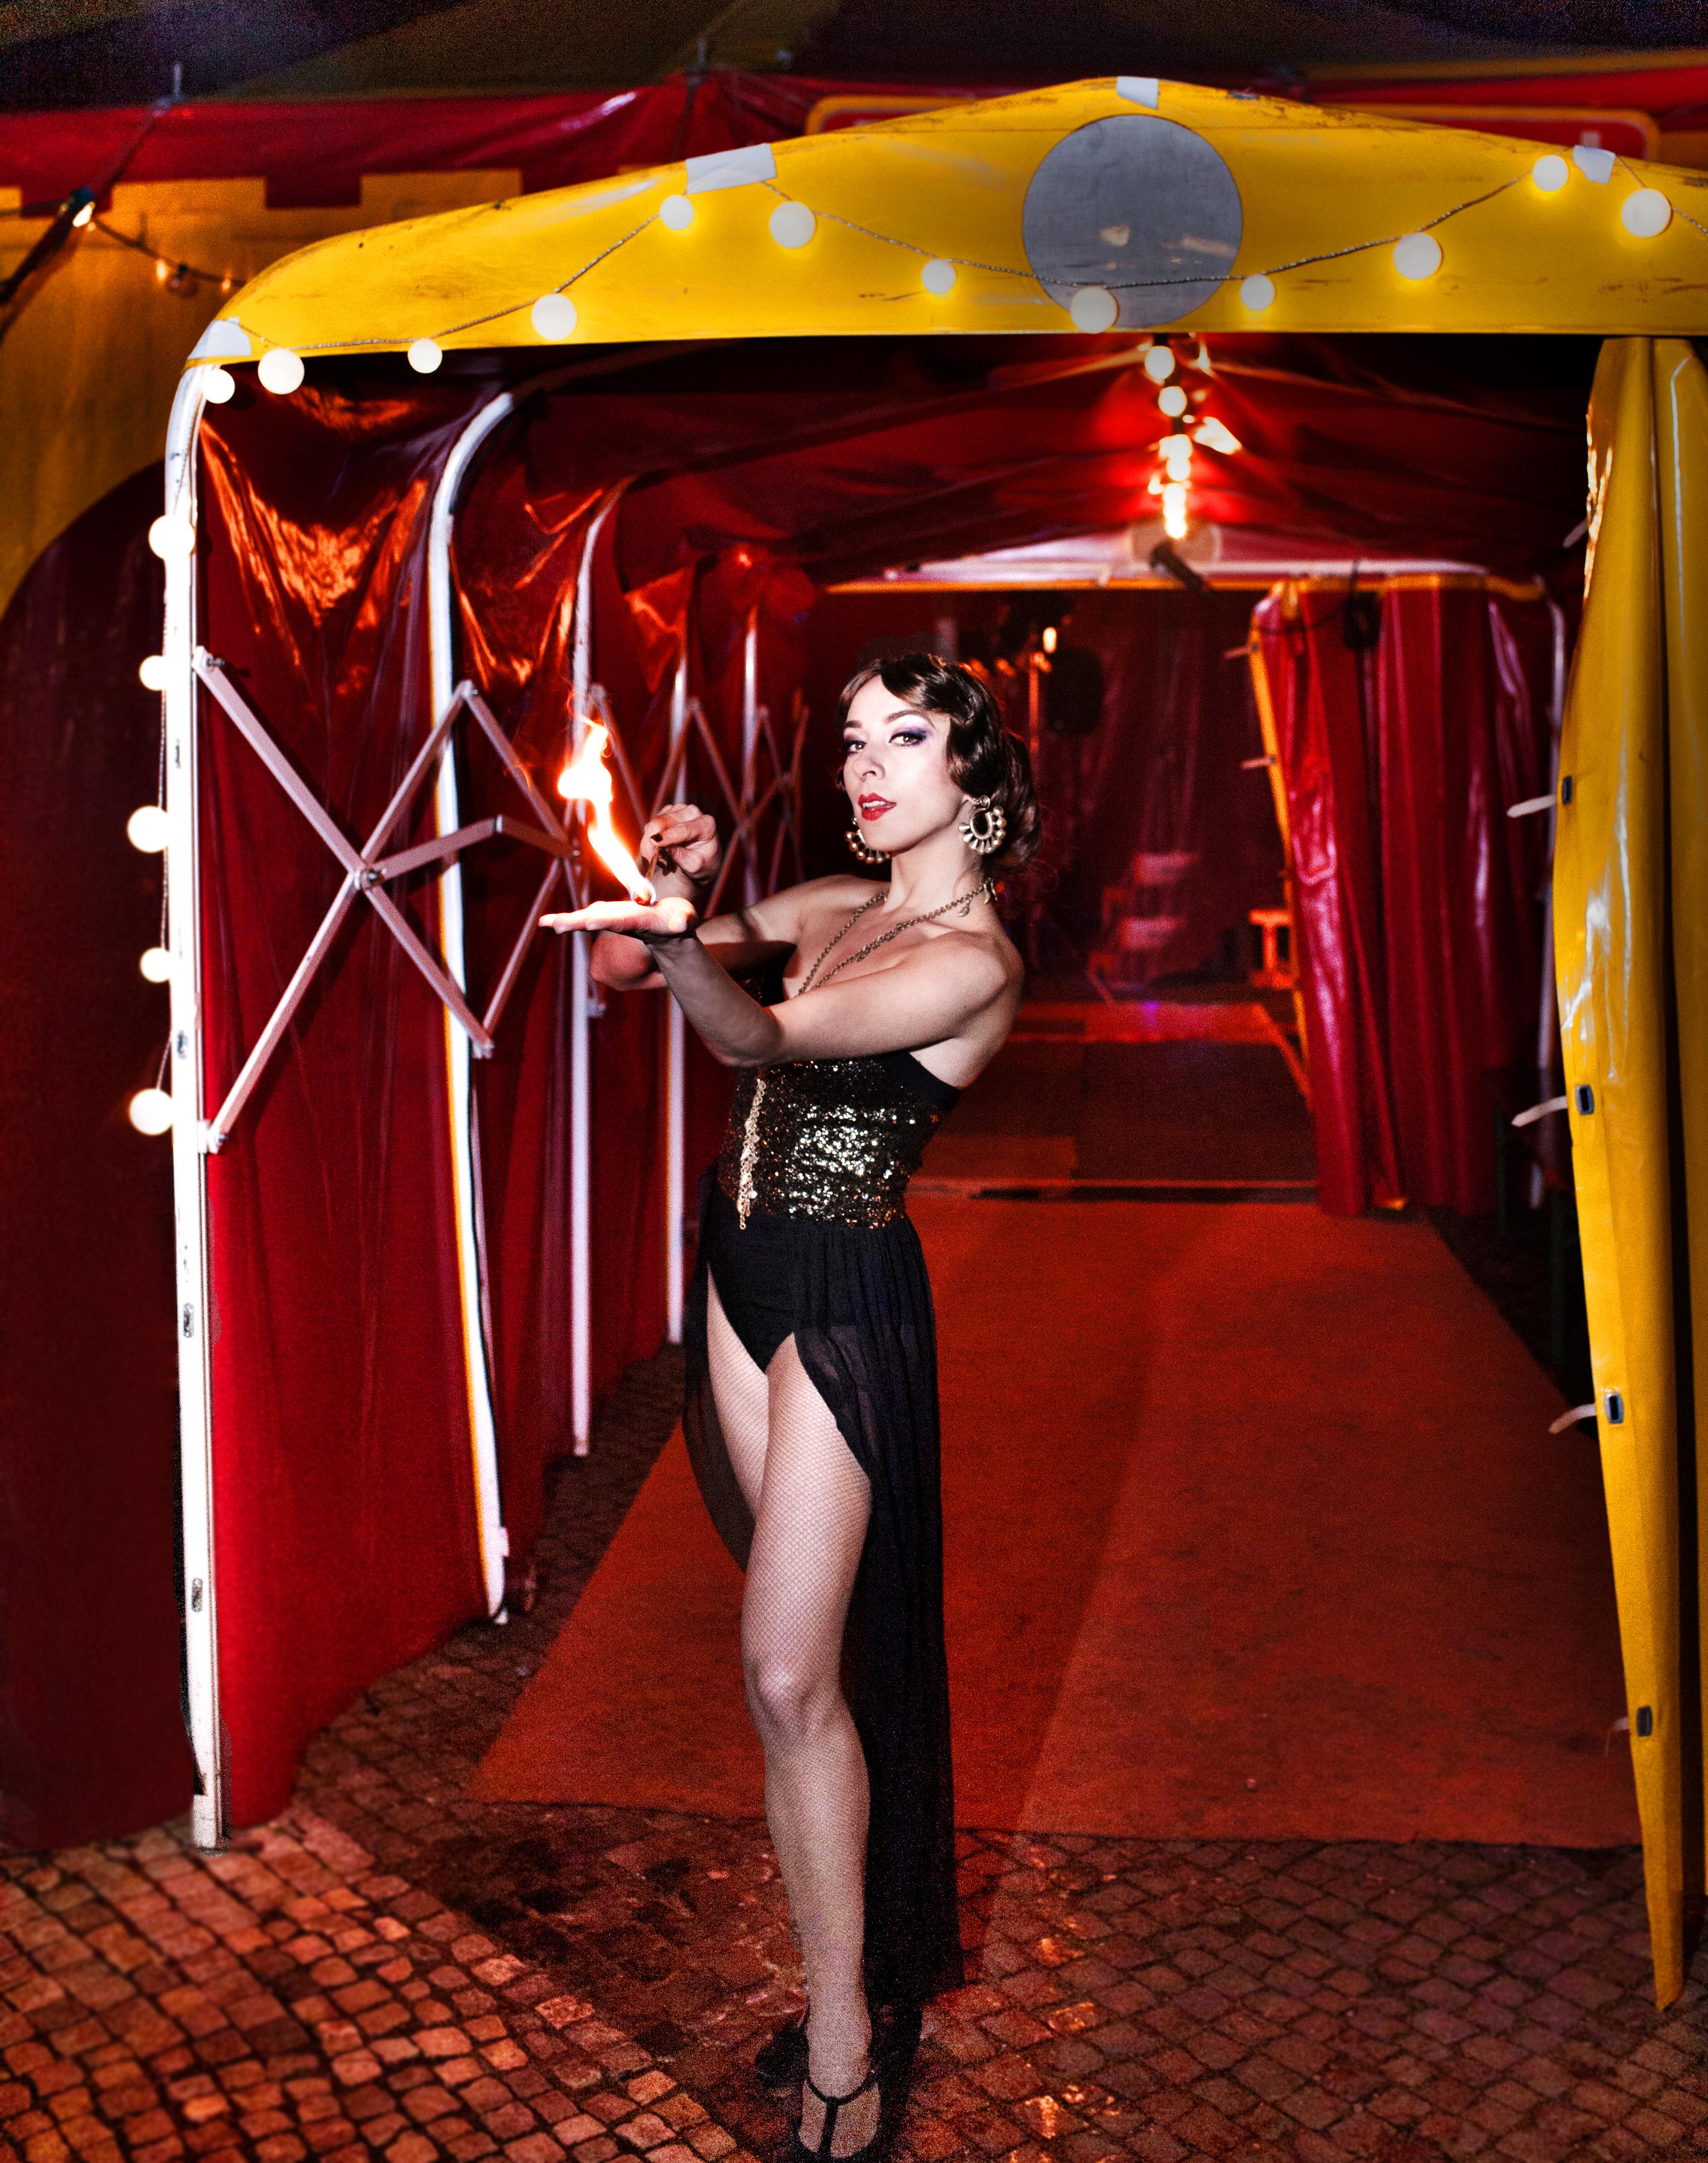 Yazz burlesque dance fire eater